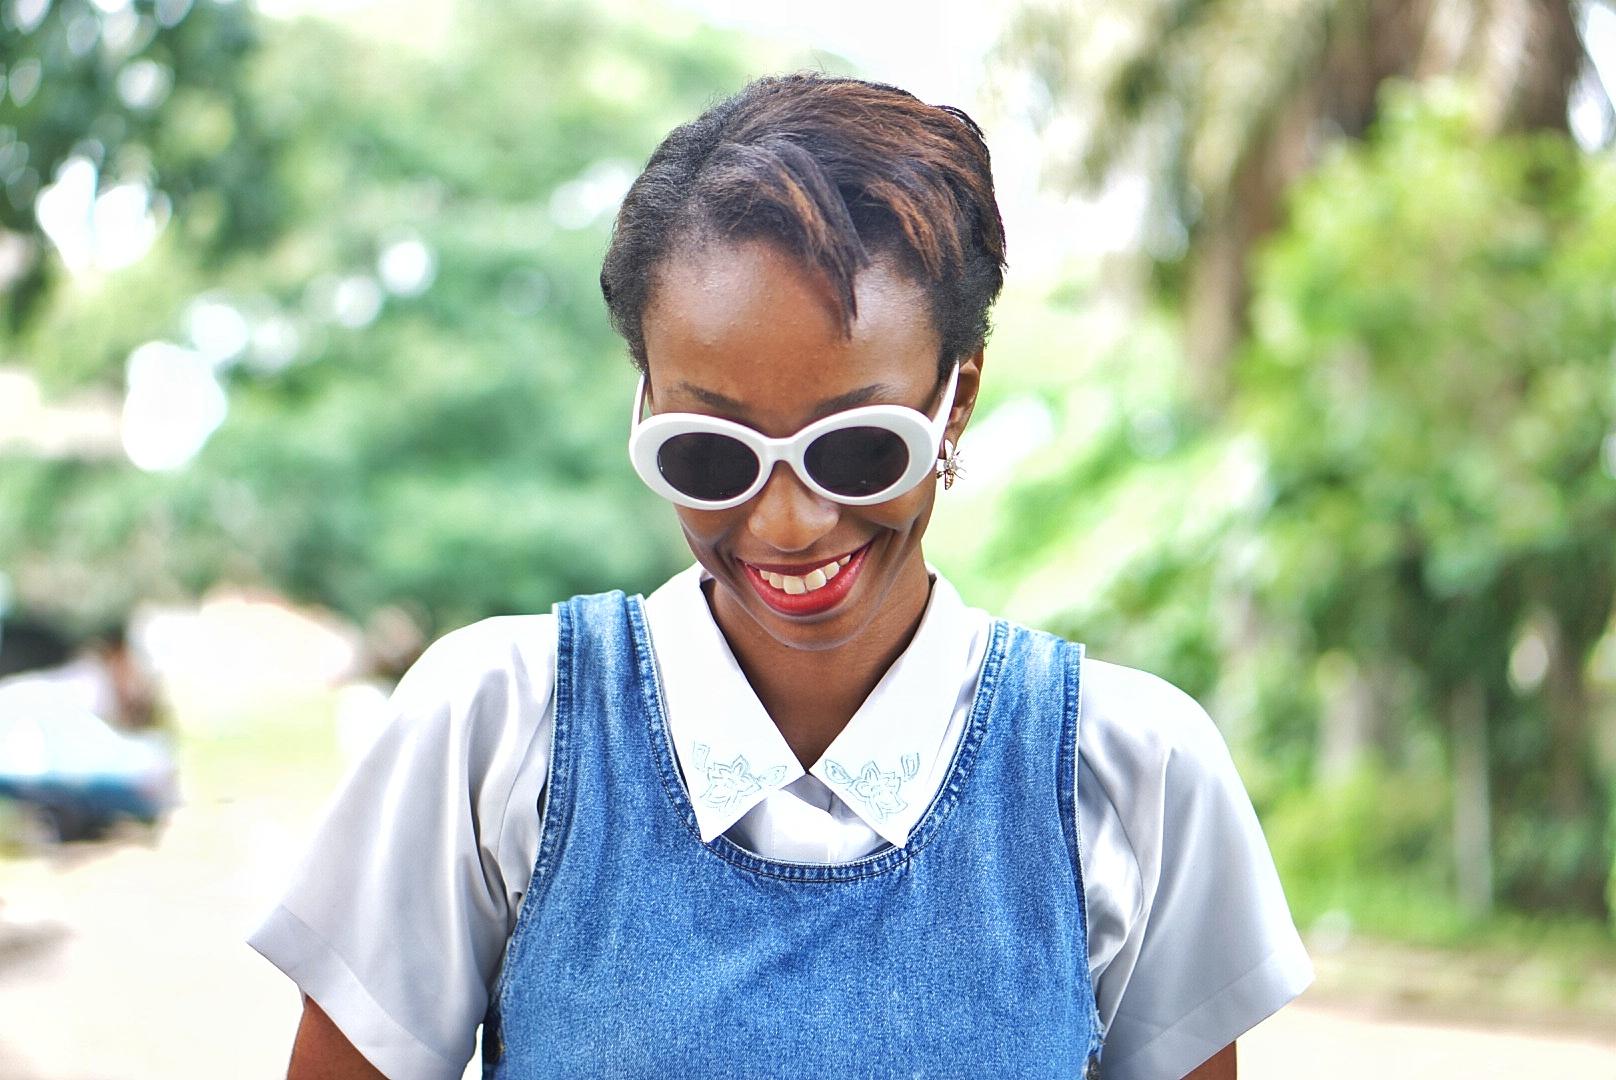 Nigerian fashion blogger Cassie Daves smiling with kurt cobain sunshades on